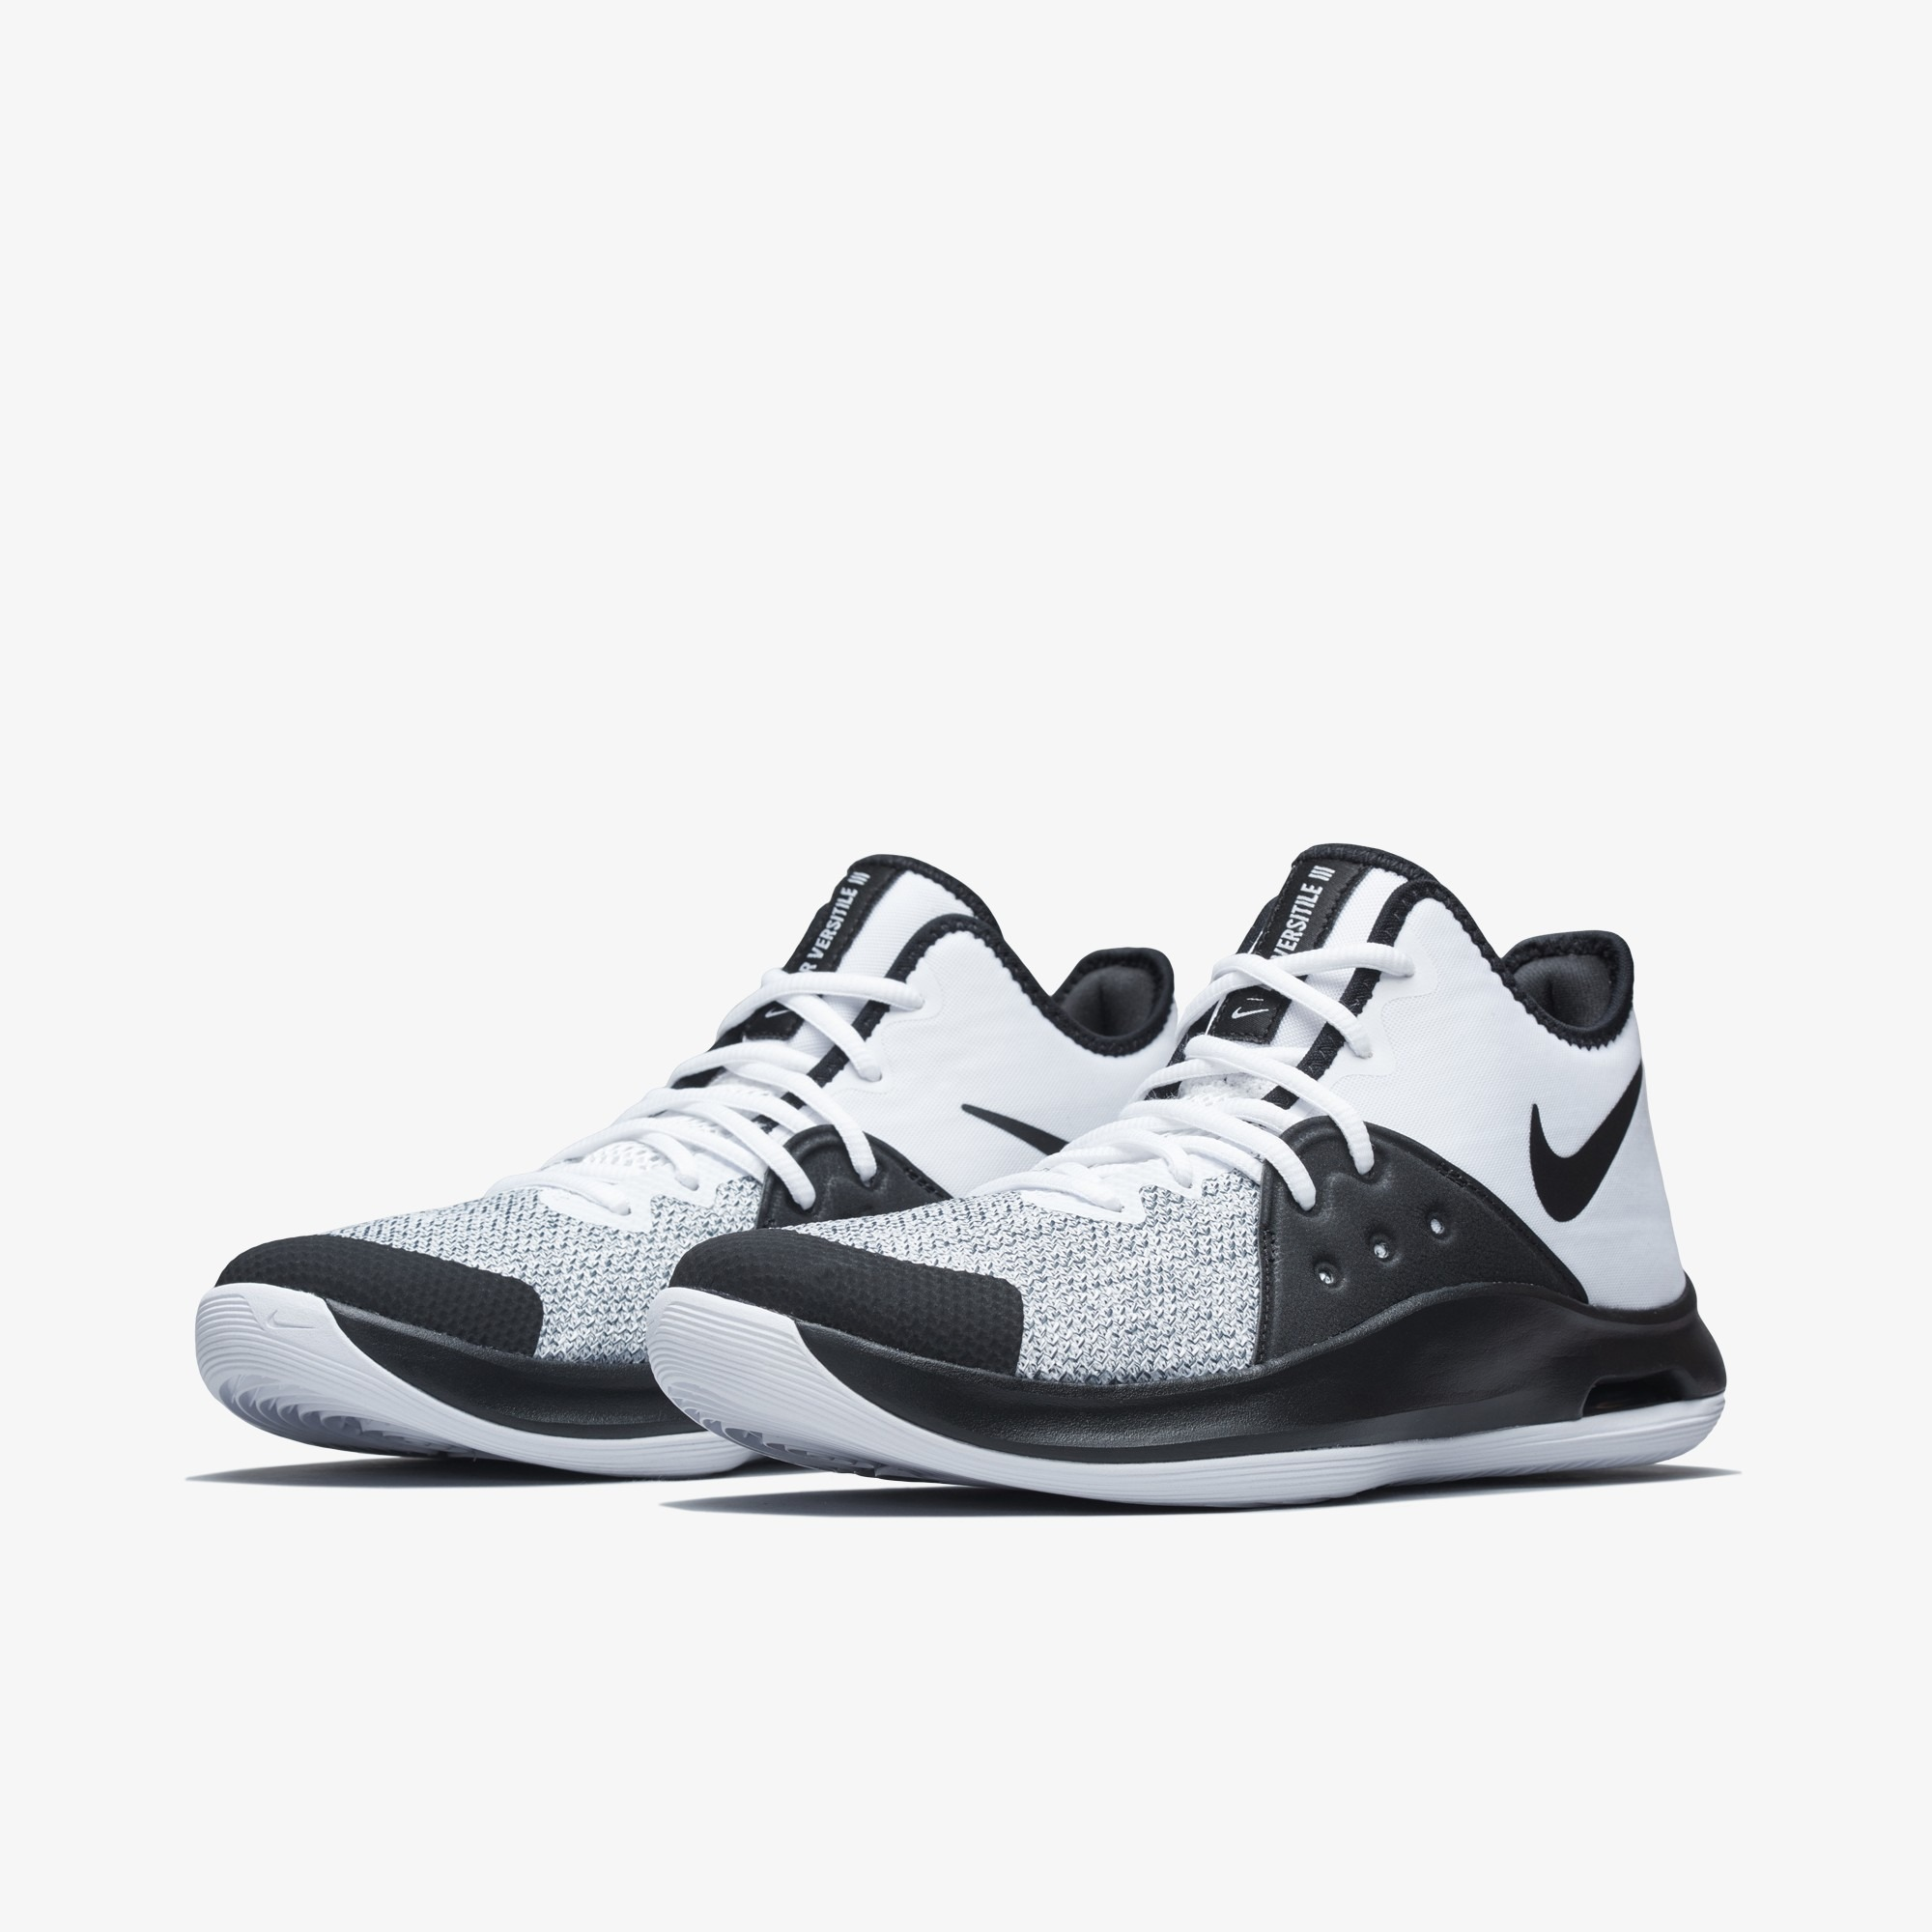 wholesale dealer 7e236 acdb6 Nike Air Versitile III Basketball Shoes - BASKETBALL SHOES NIKE Basketball  Shoes - Superfanas.lt